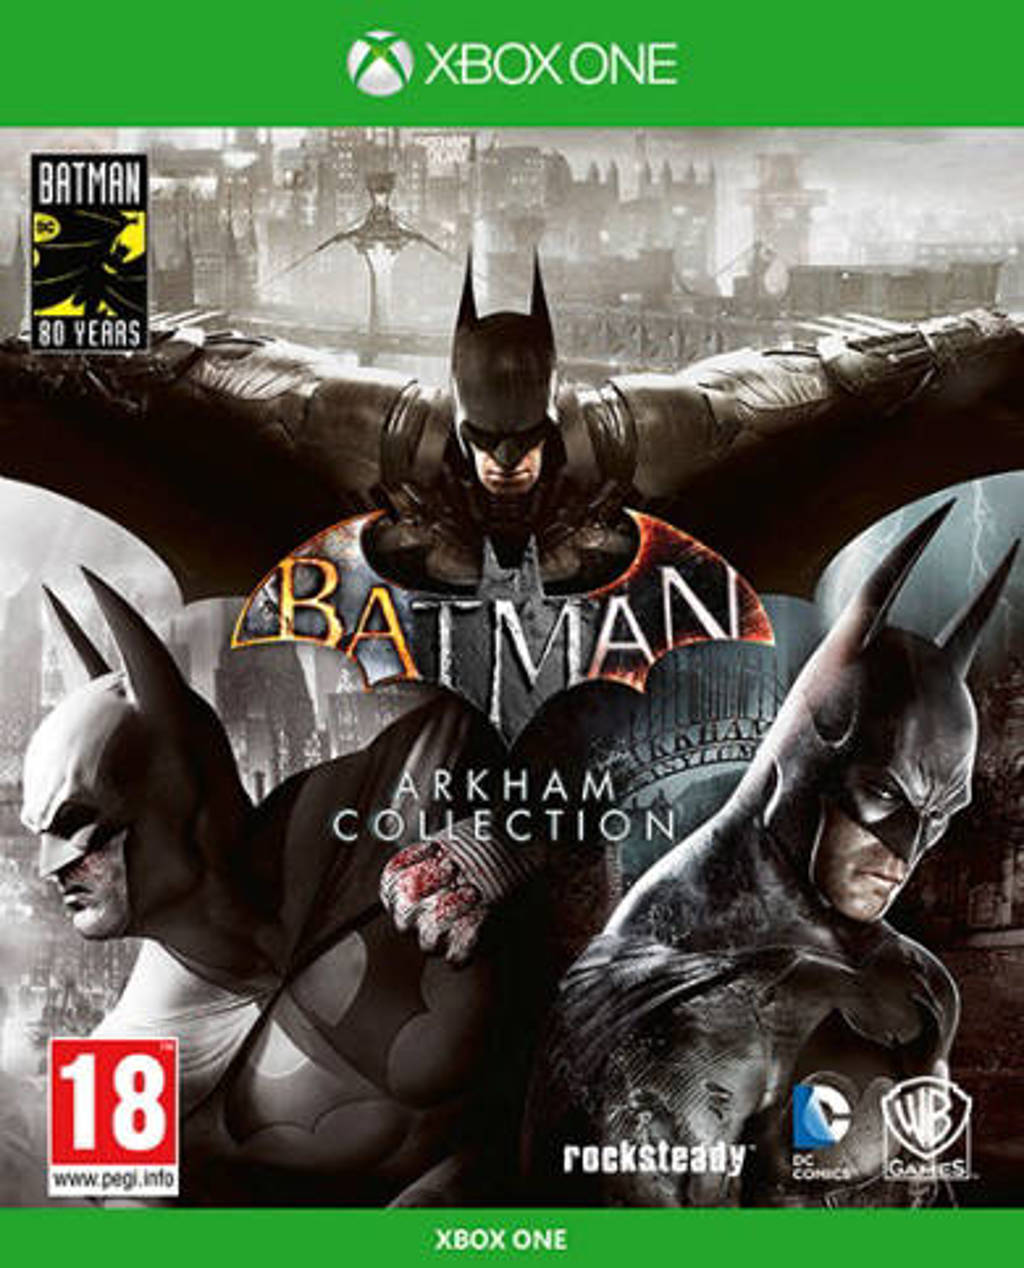 Batman - Arkham collection (Xbox One)